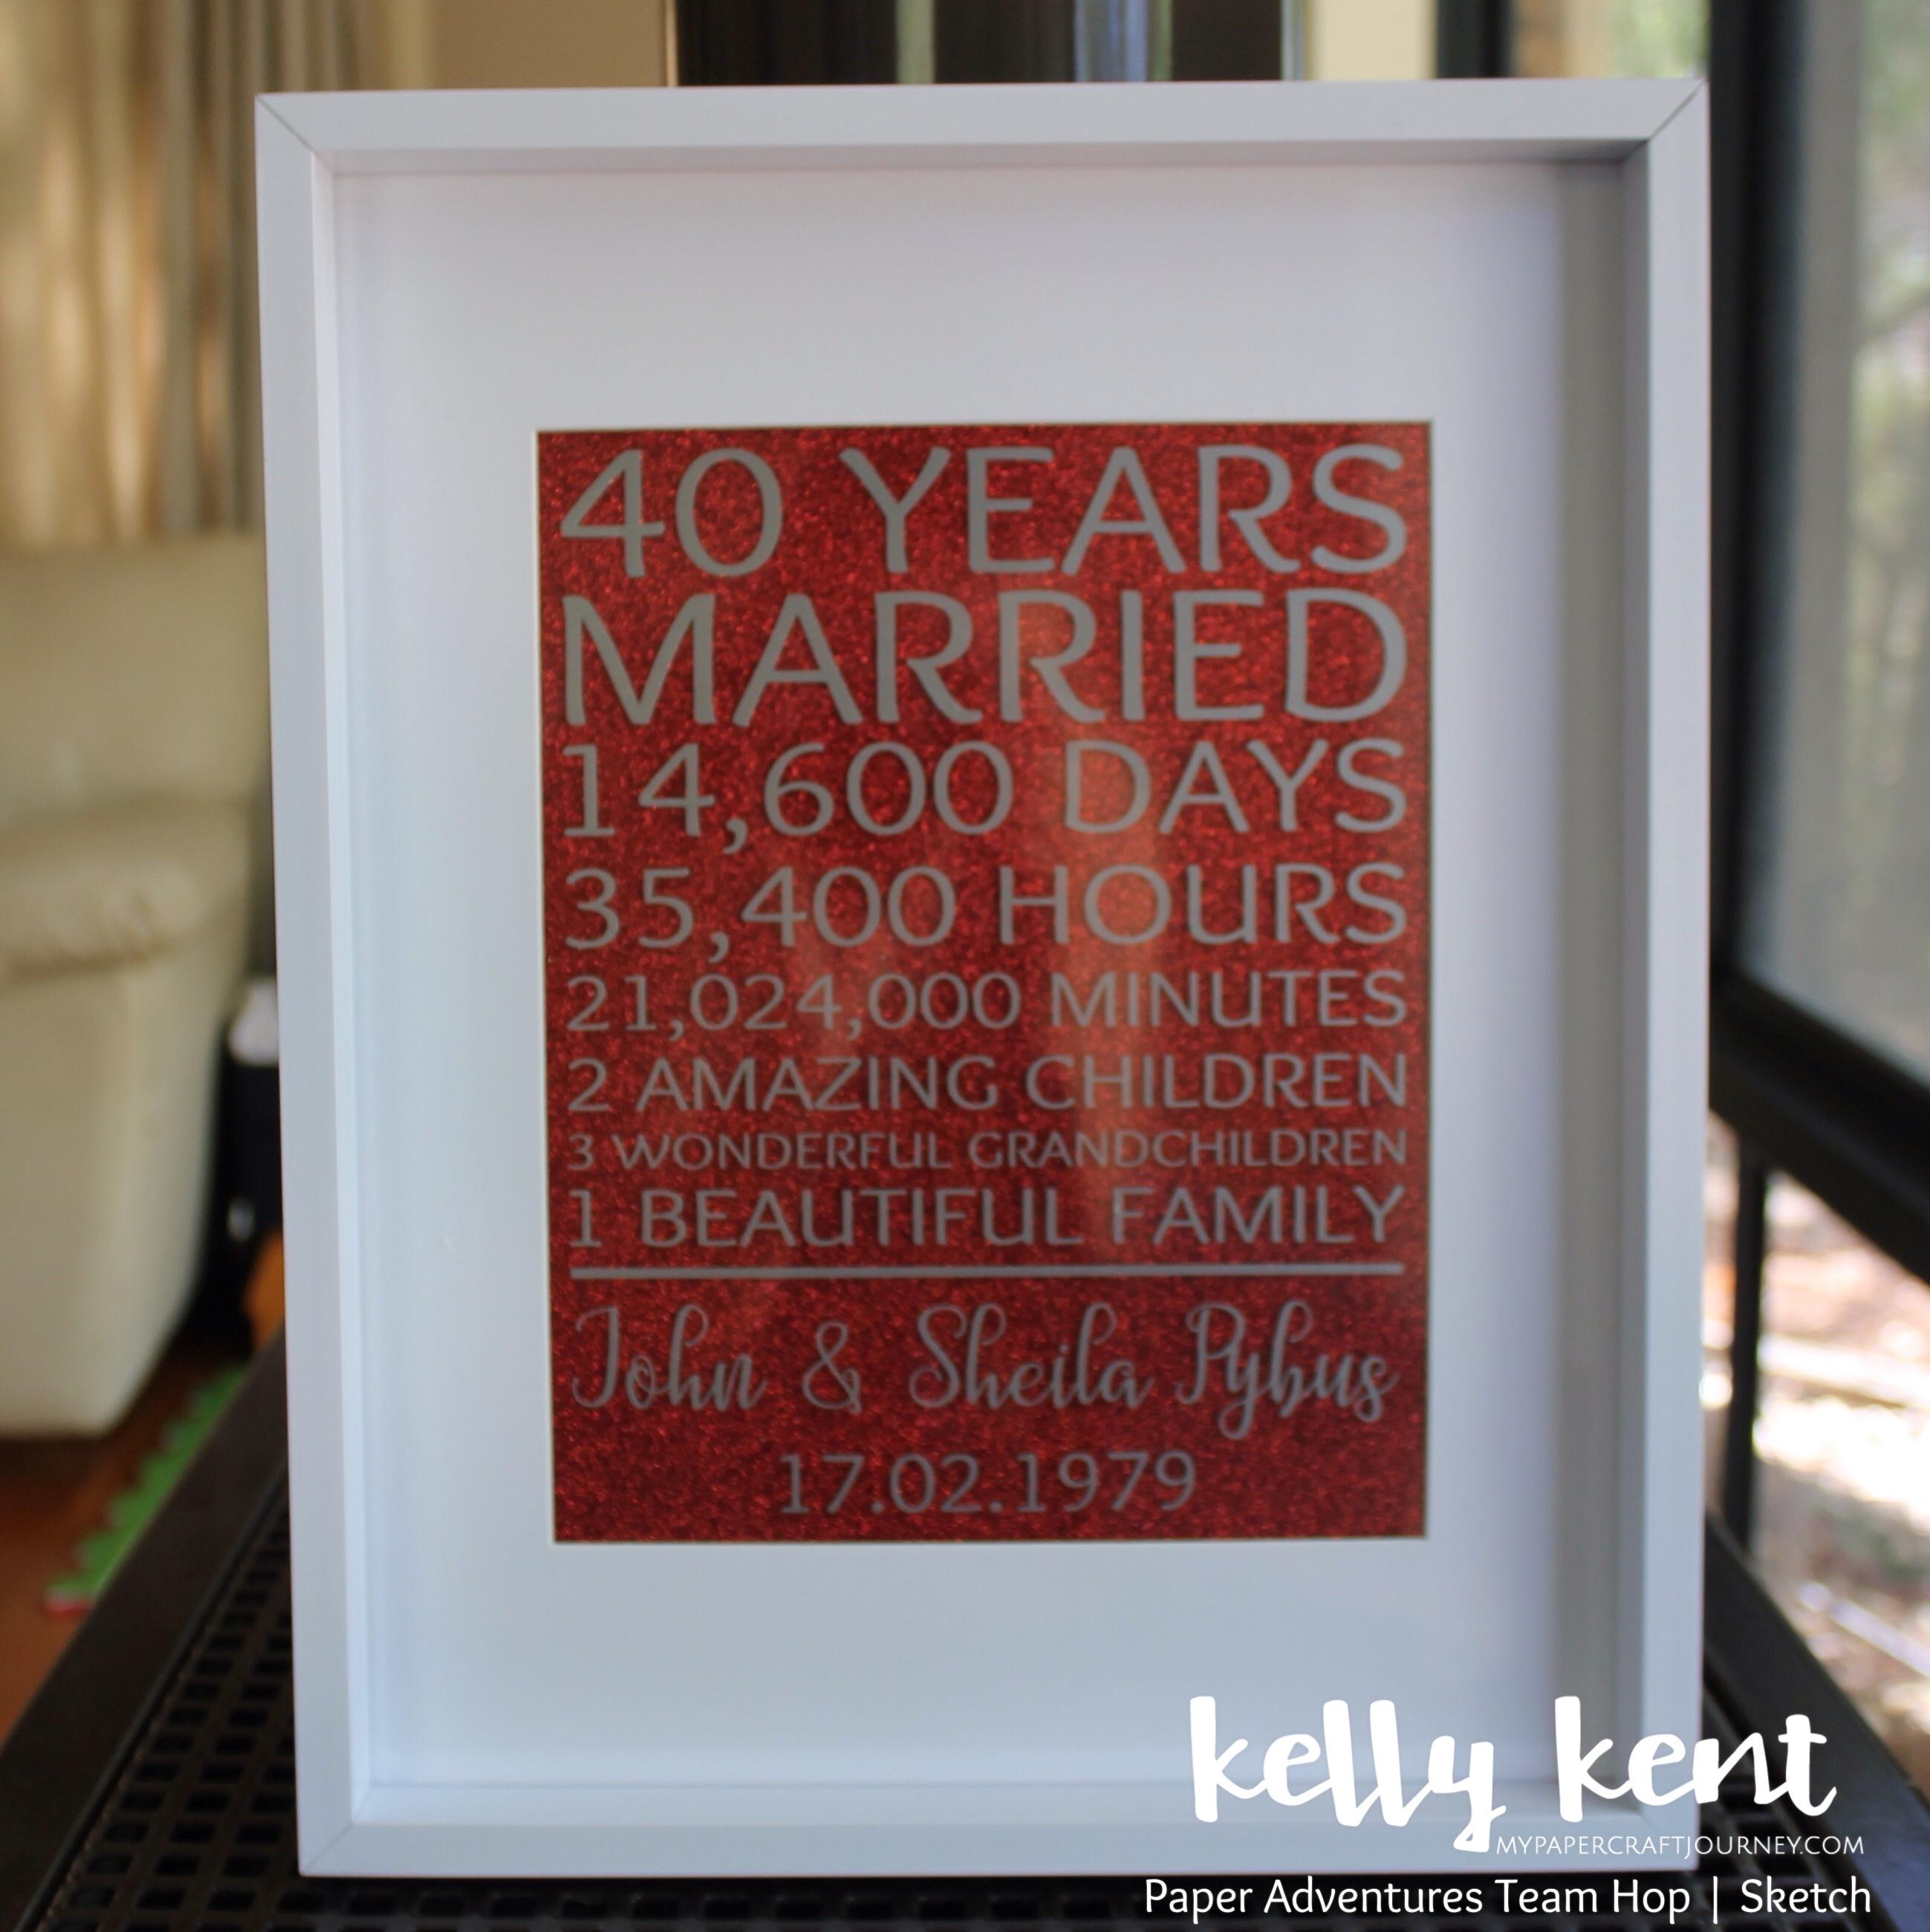 Fortieth Wedding Anniversary | kelly kent